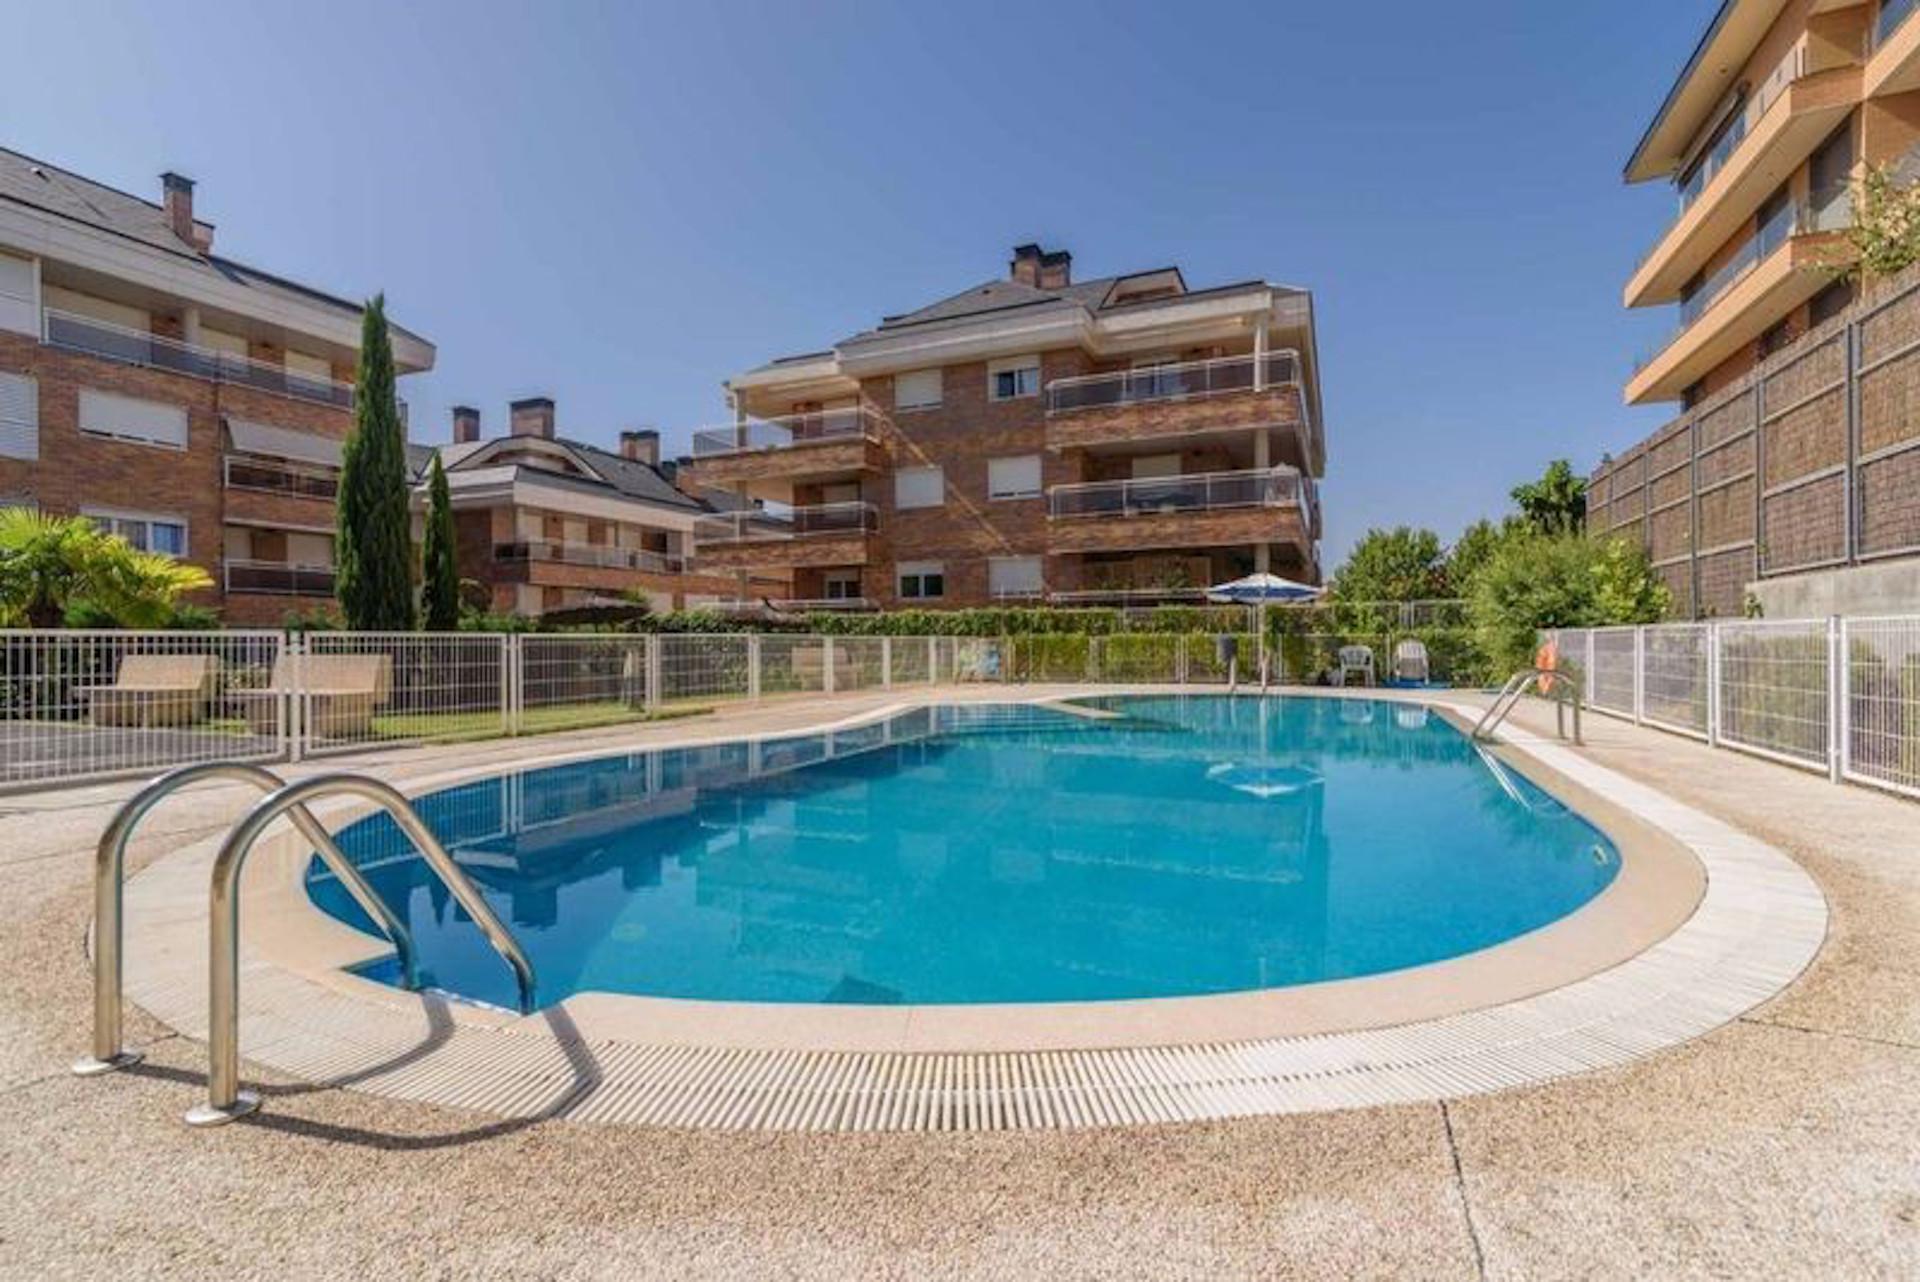 residencial_mirabal_boadilla_del_monte_piscina